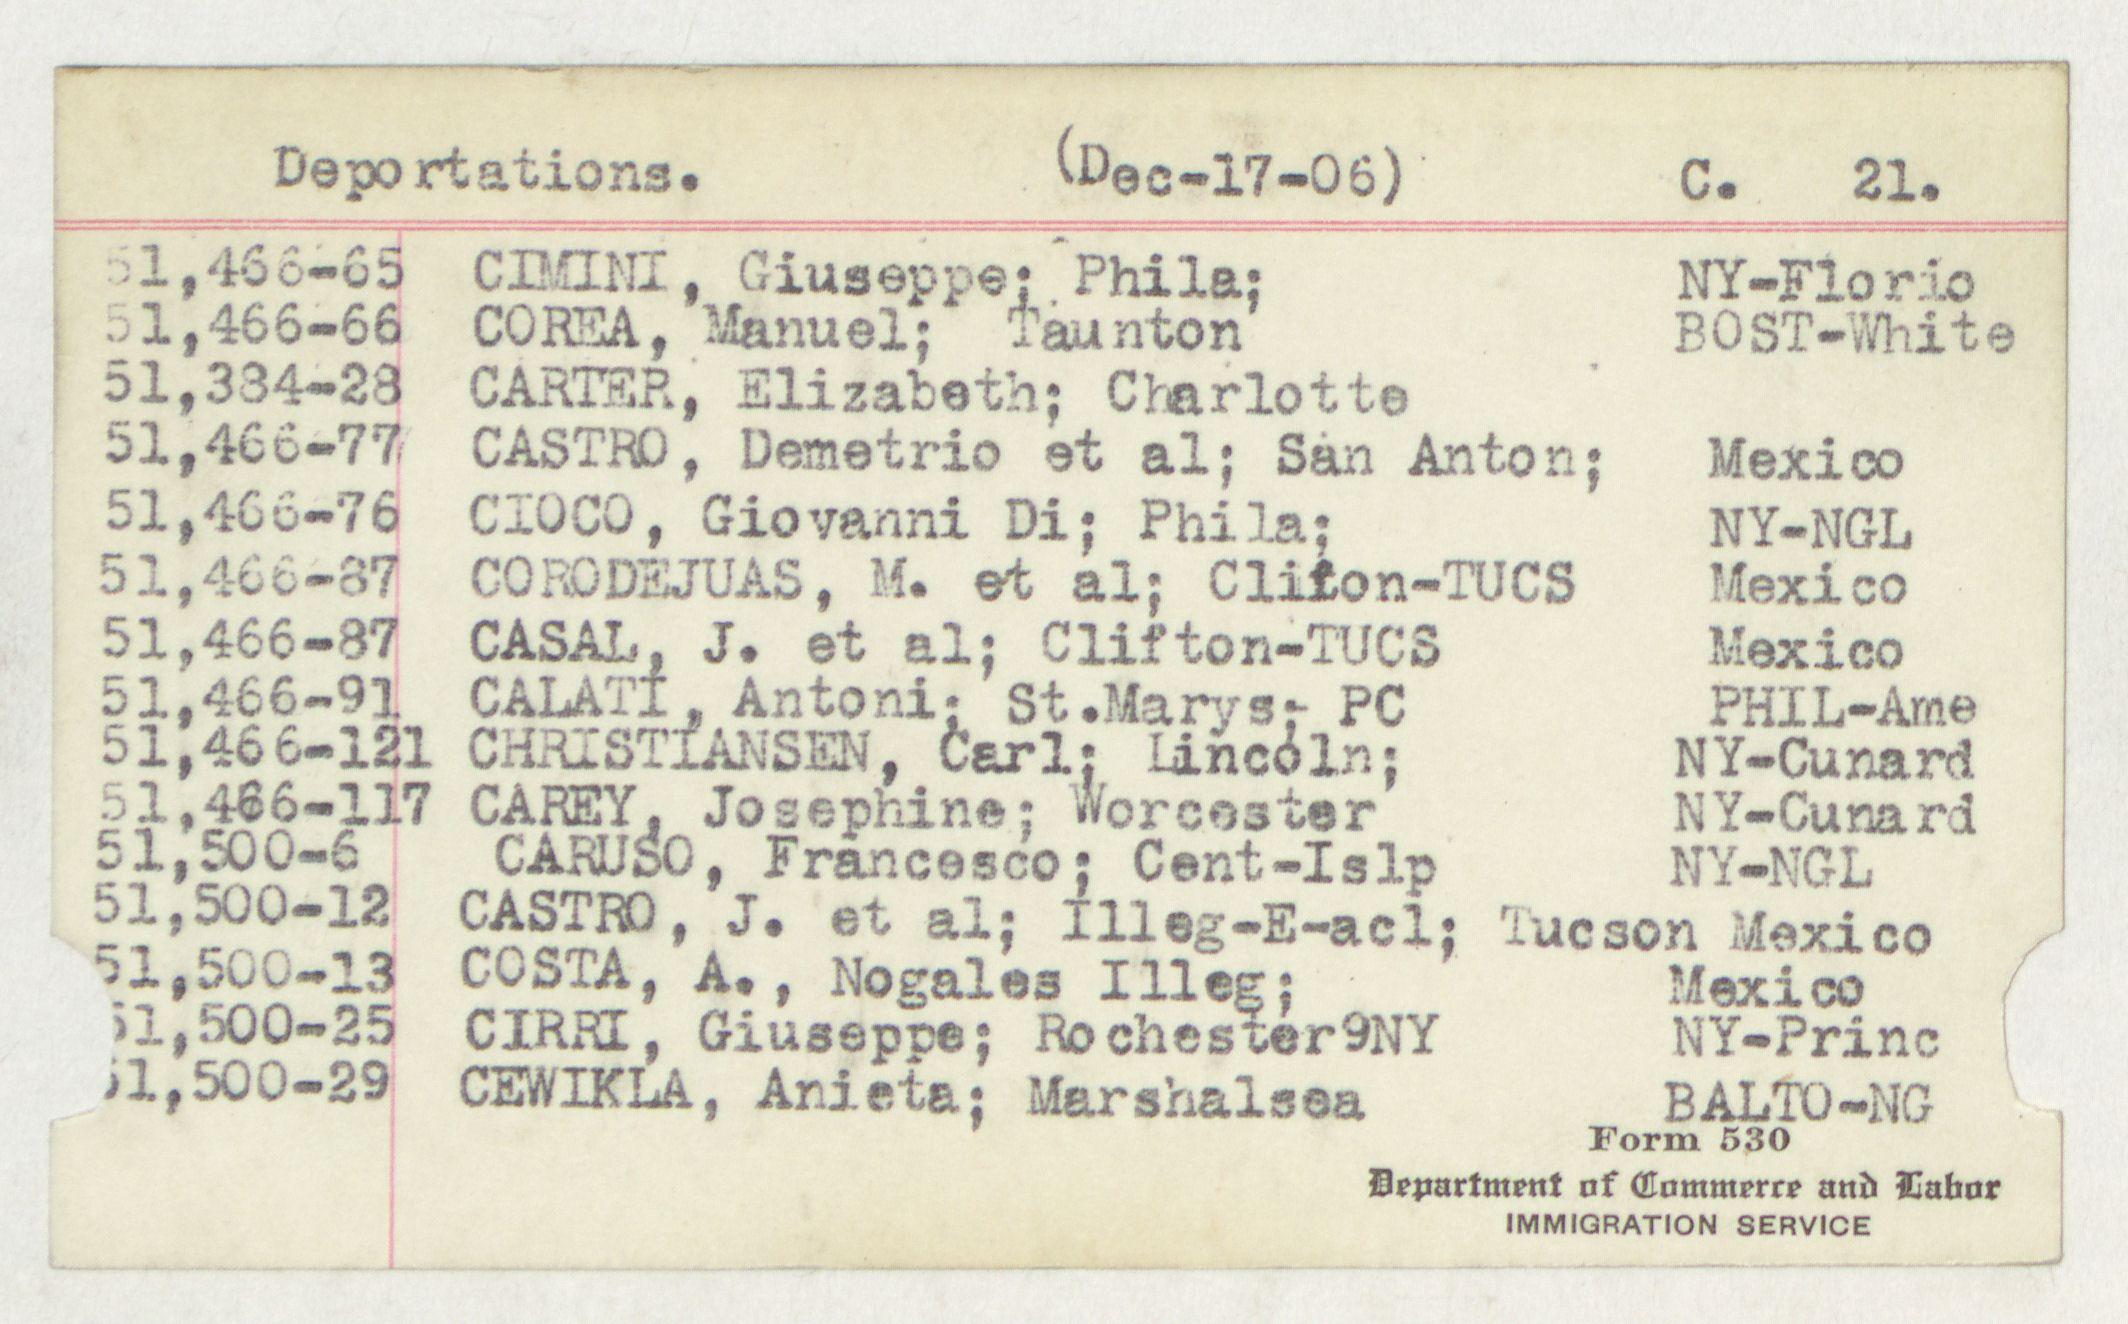 Index Card - C - Deportations - C - 21